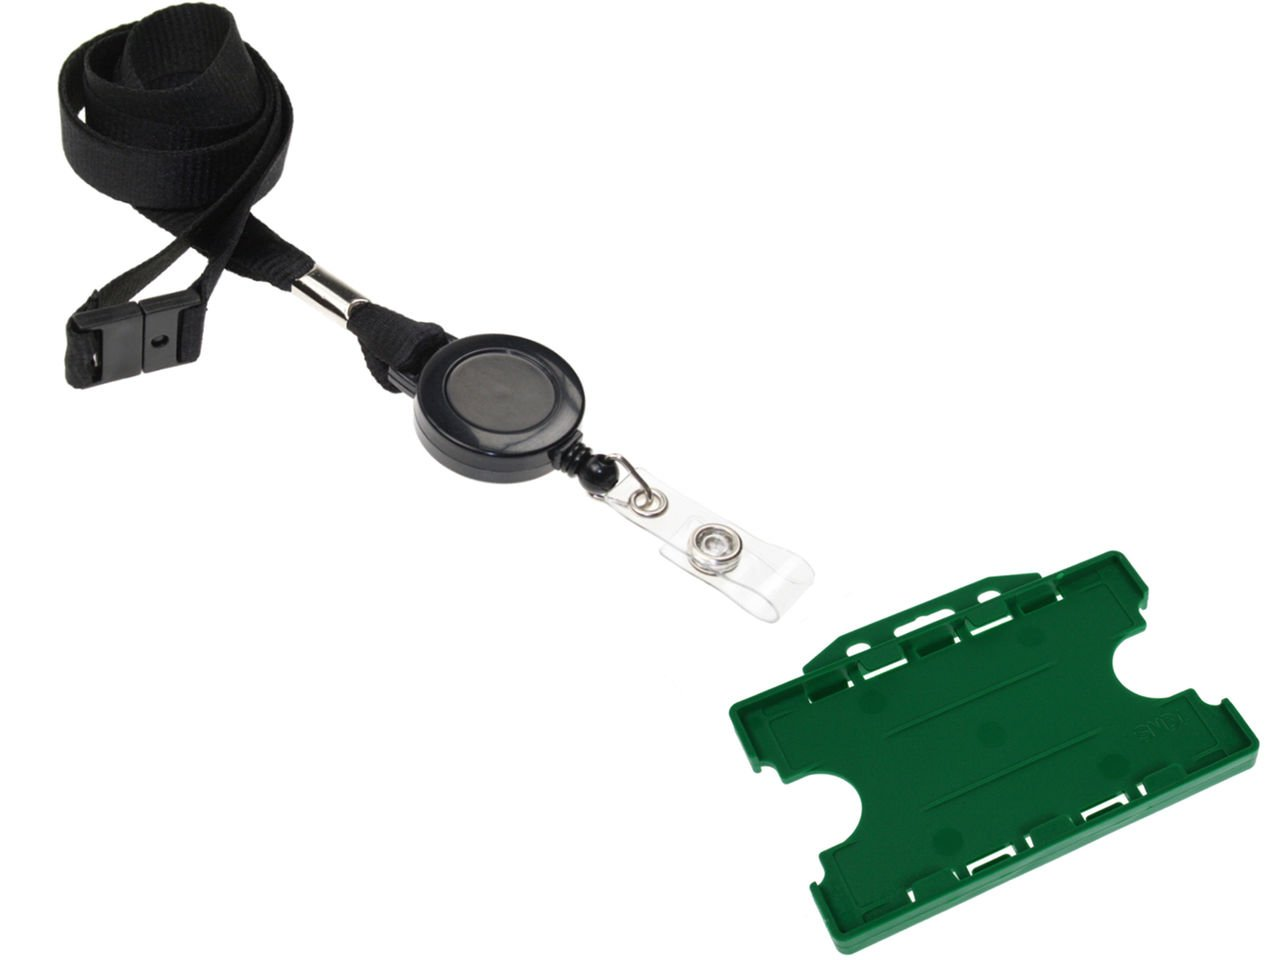 ID Card It Dark Green ID Badge Holder 2-sided, with Black Lanyard Neck Strap and Integrated Yo-Yo Badge Reel - 100